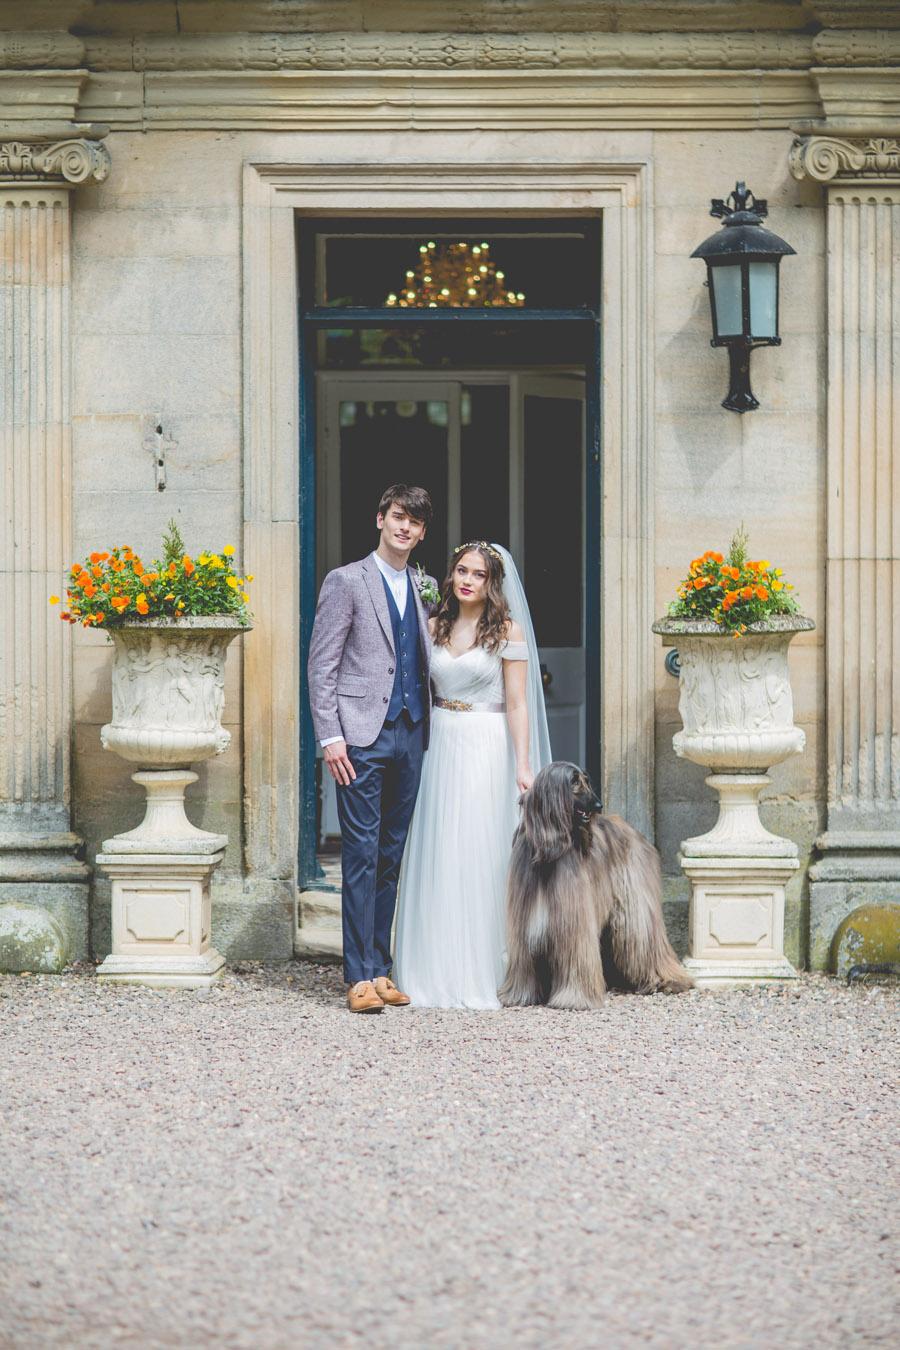 Eshott Hall wedding inspiration, credit Sean Elliott Photography (18)